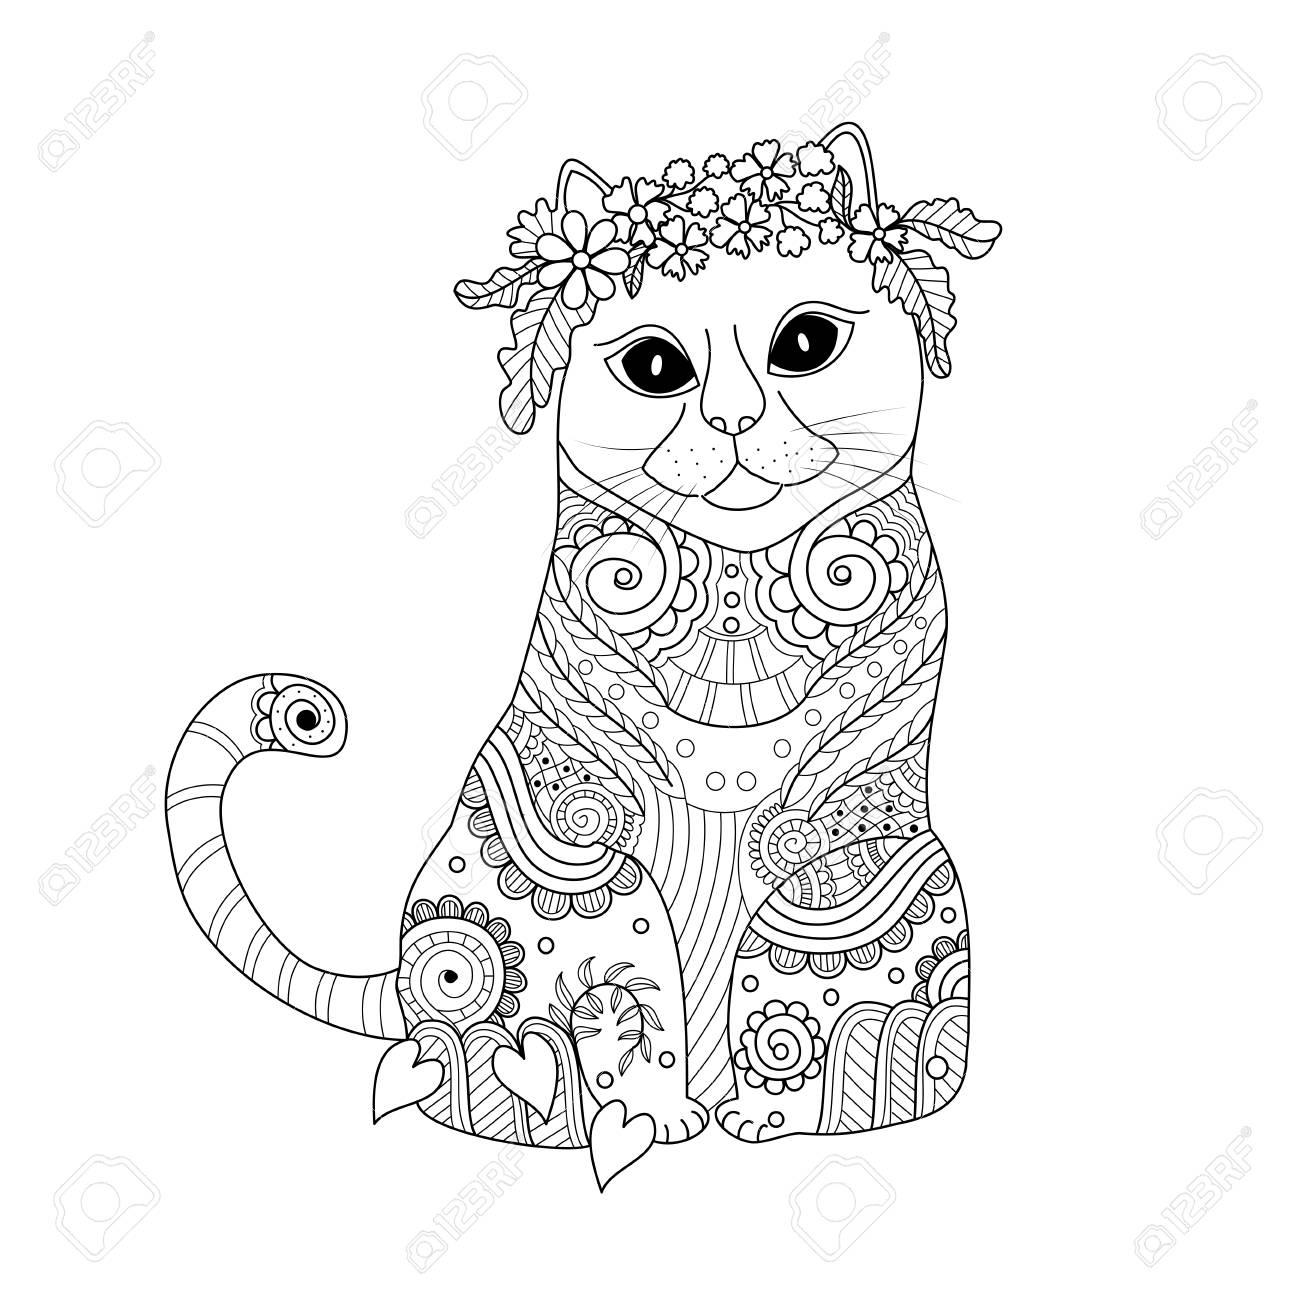 Coloring Book Page Of Cat Doodle Style. Lizenzfrei Nutzbare ...